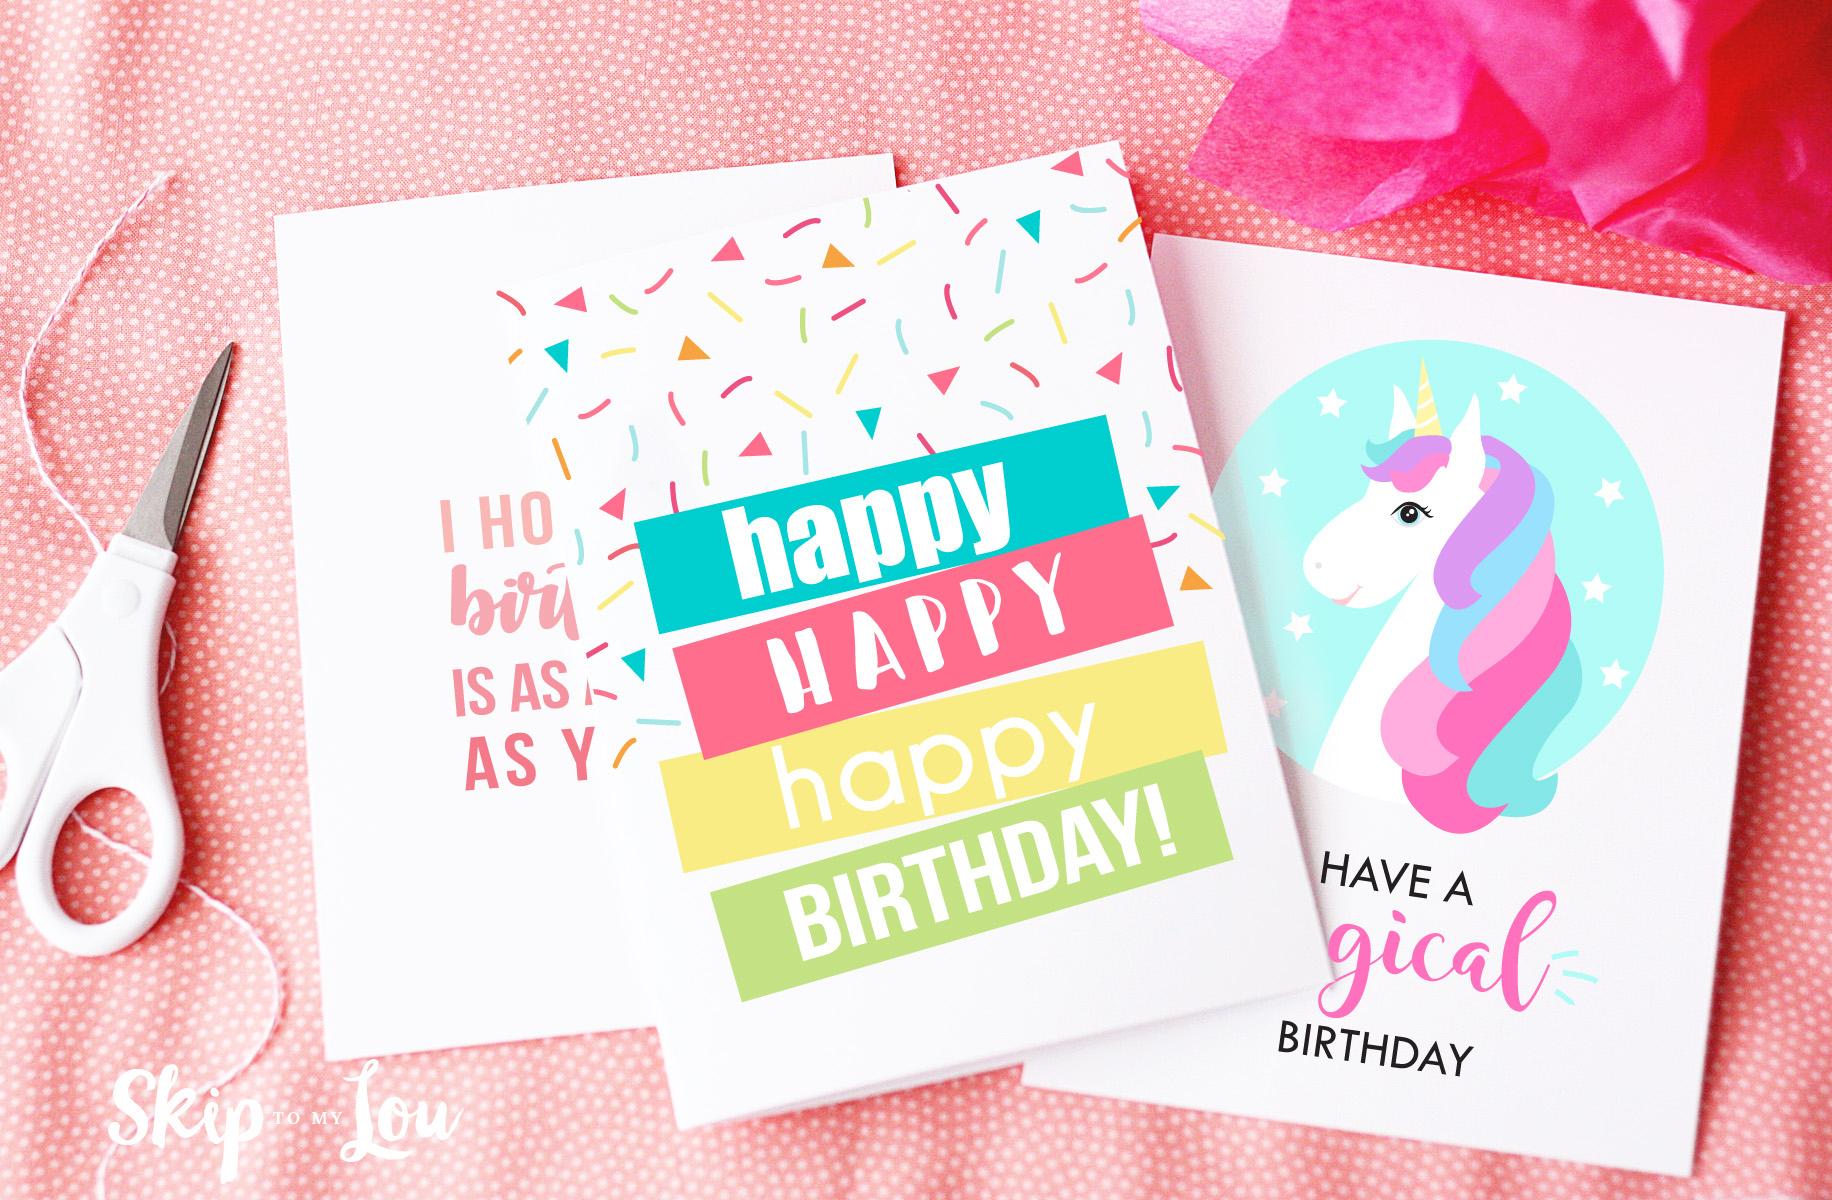 Free Printable Birthday Cards | Skip To My Lou - Free Printable Birthday Cards For Wife